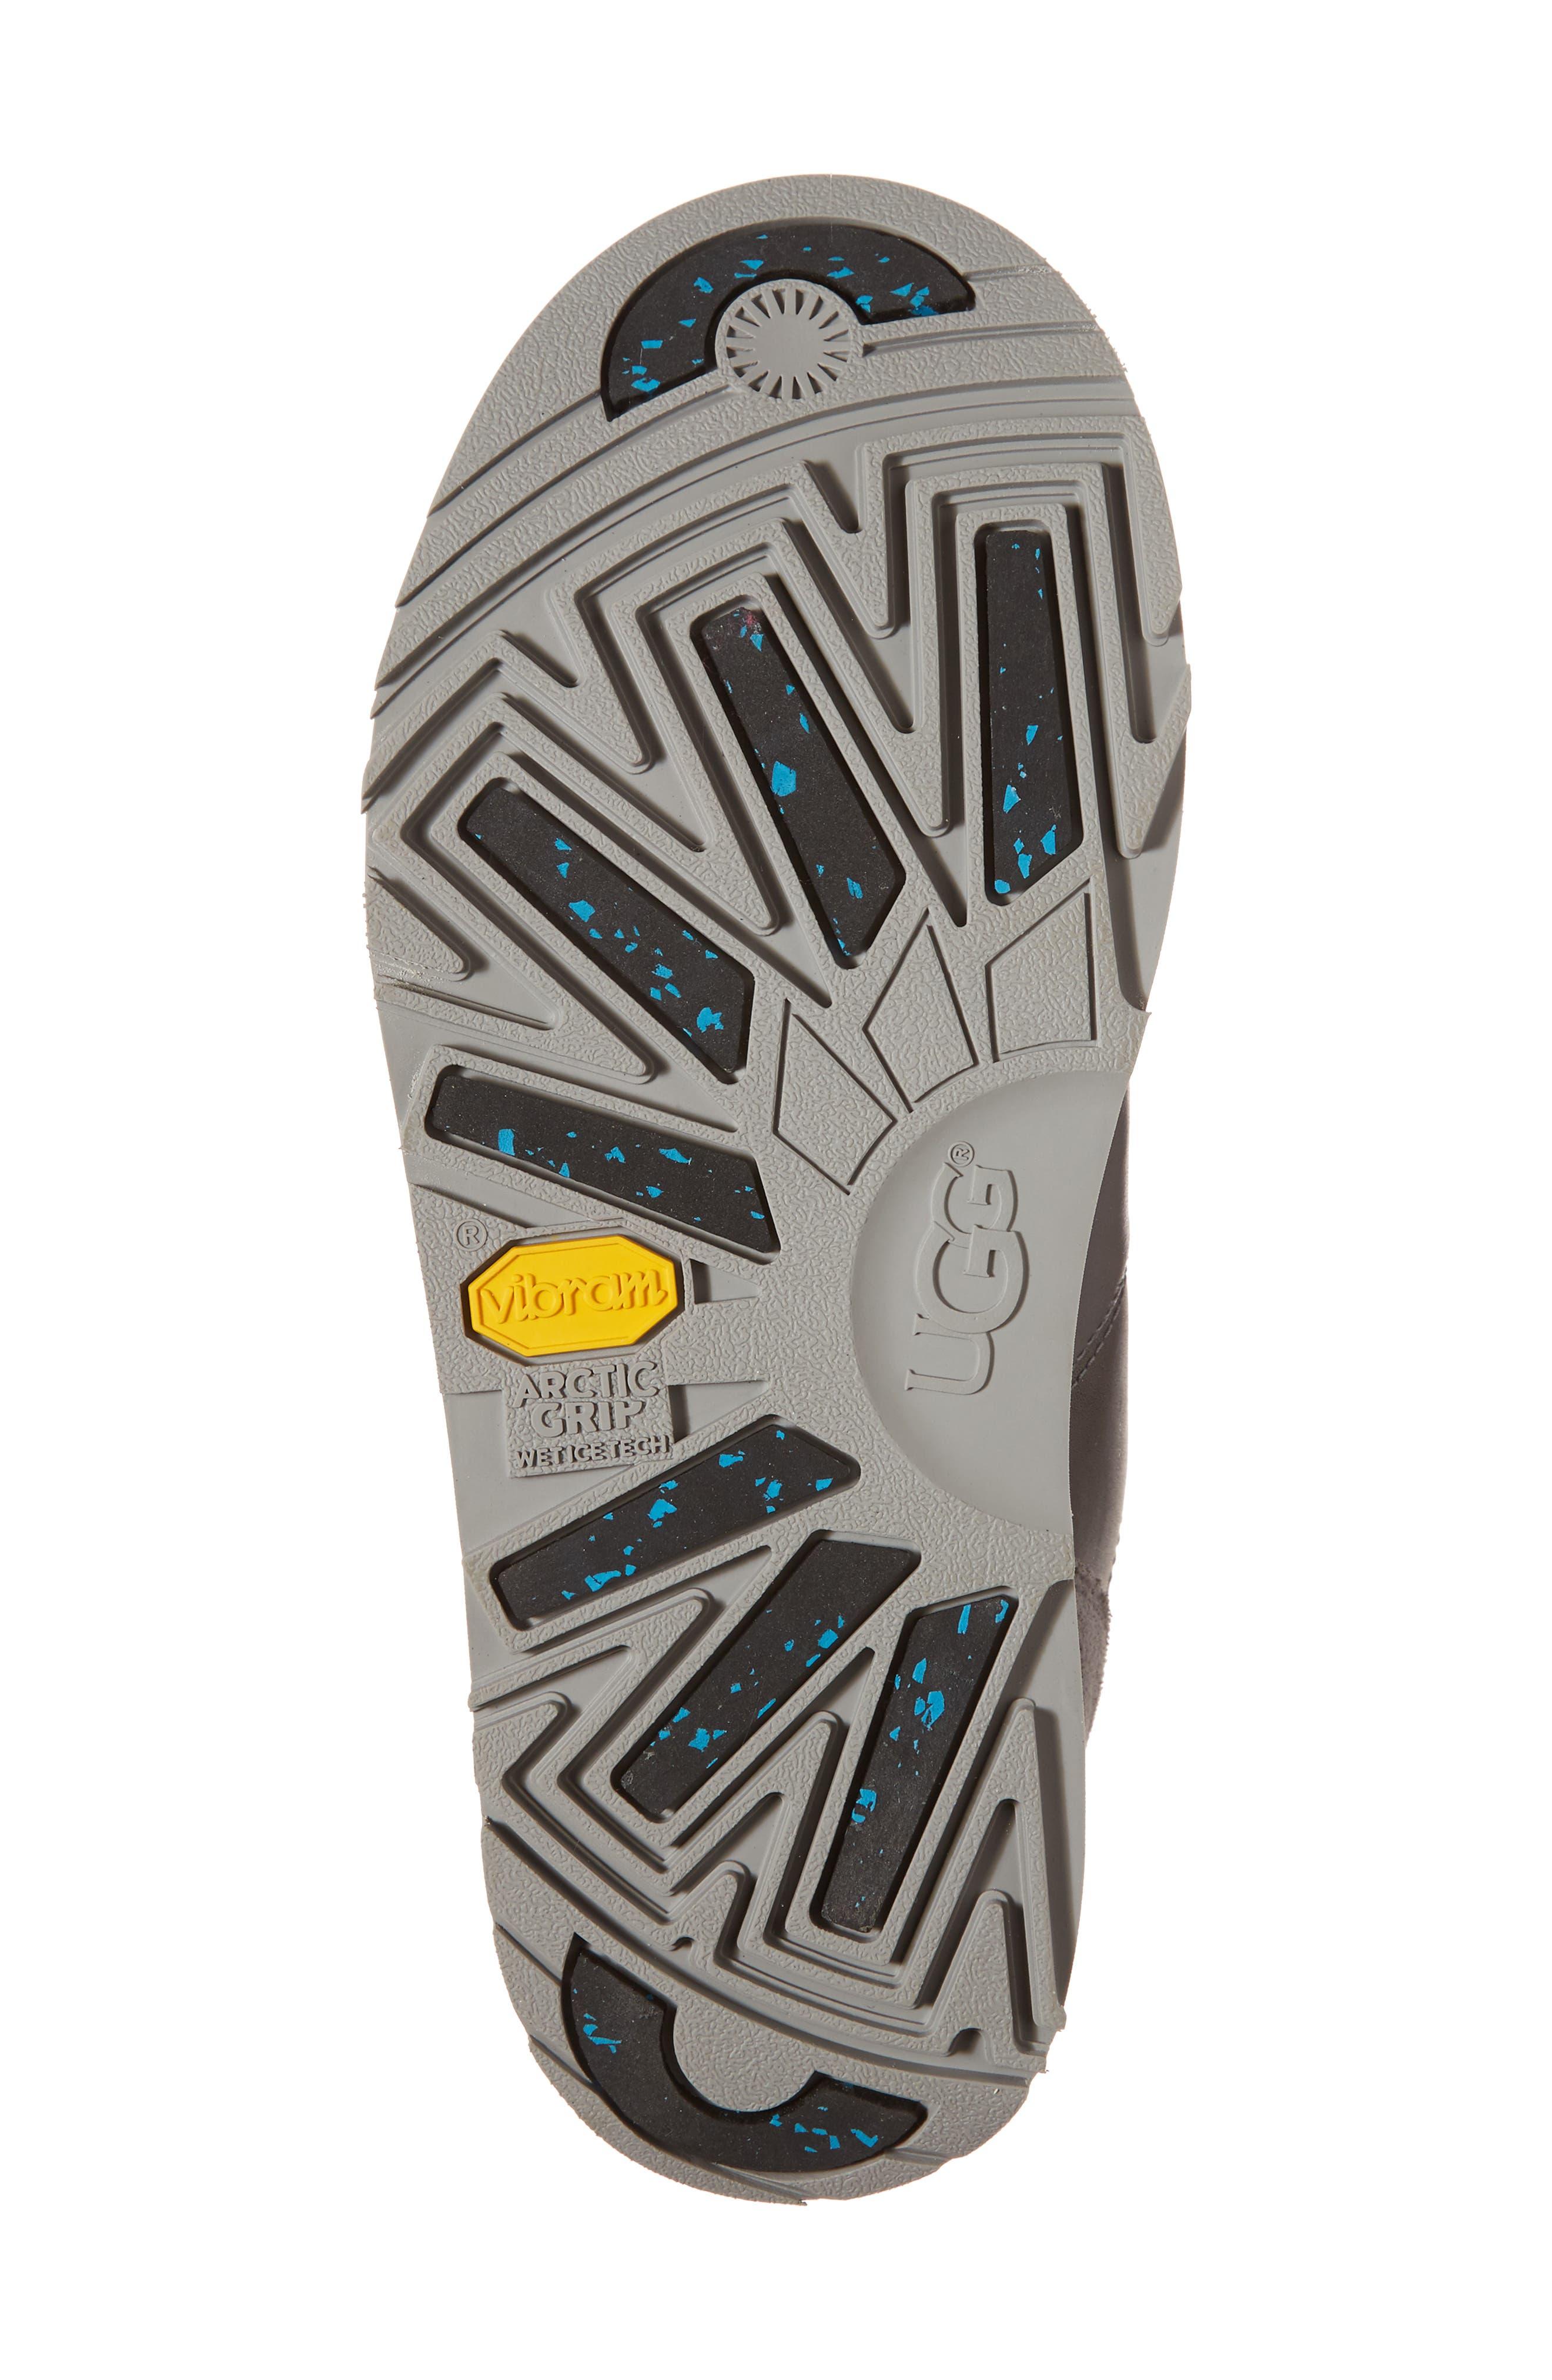 Viki Waterproof Boot,                             Alternate thumbnail 6, color,                             METAL LEATHER